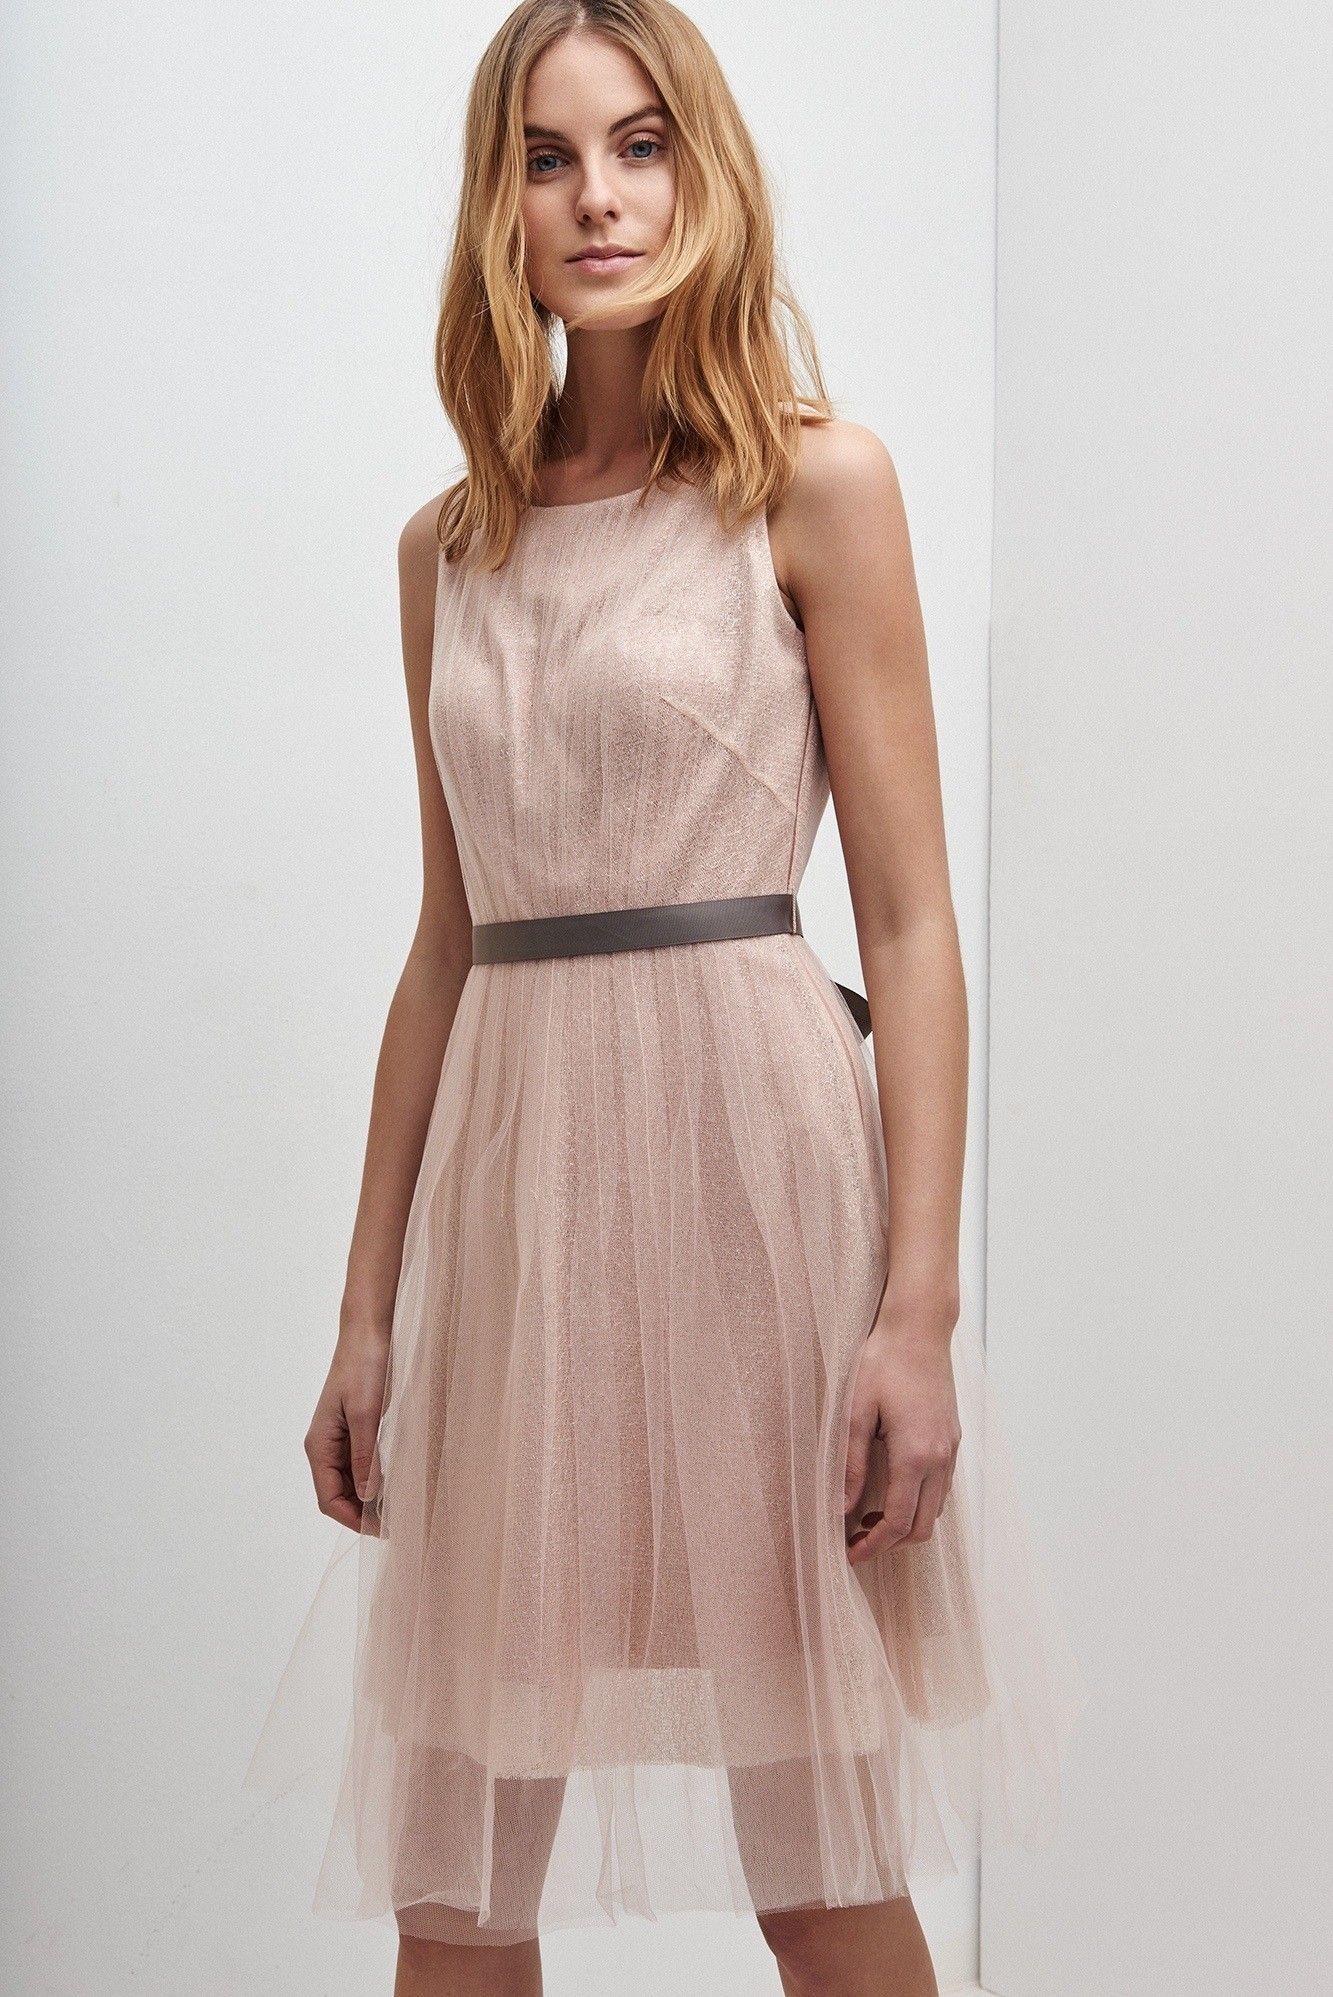 Vestido lady de tul con lazo c ctel adolfo dominguez for Vestidos adolfo dominguez outlet online